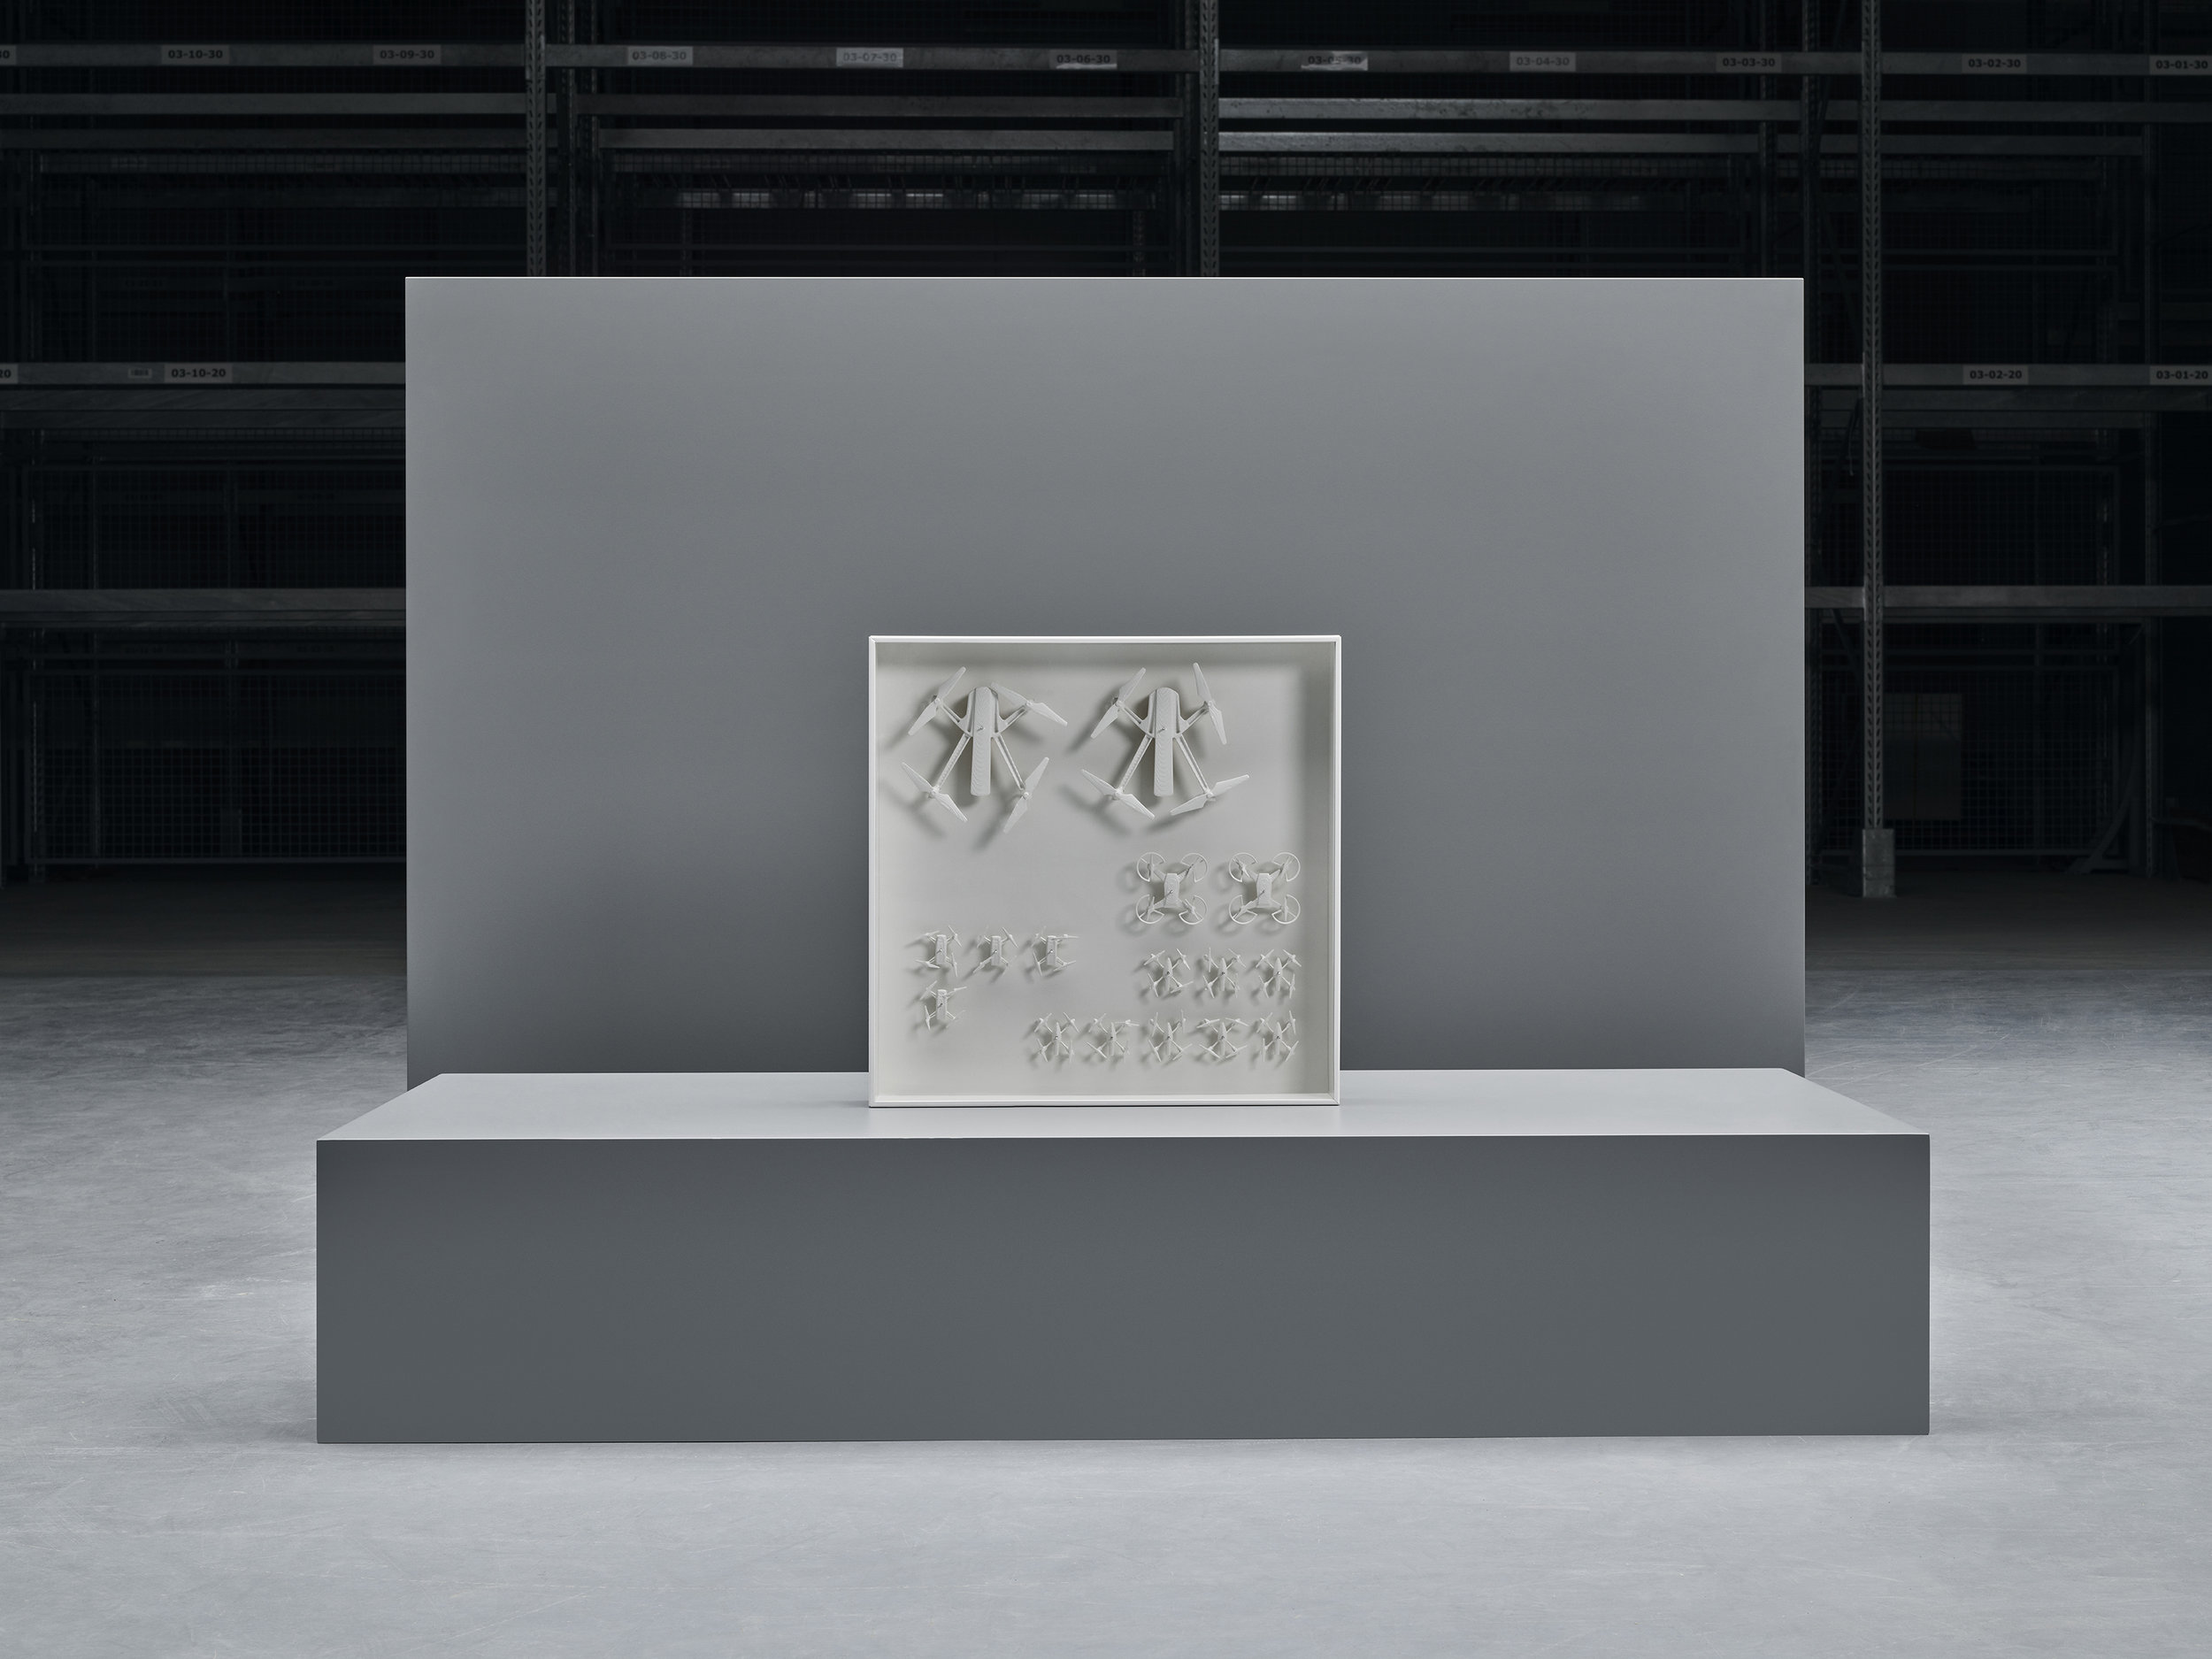 IKEA protoype press image.jpg